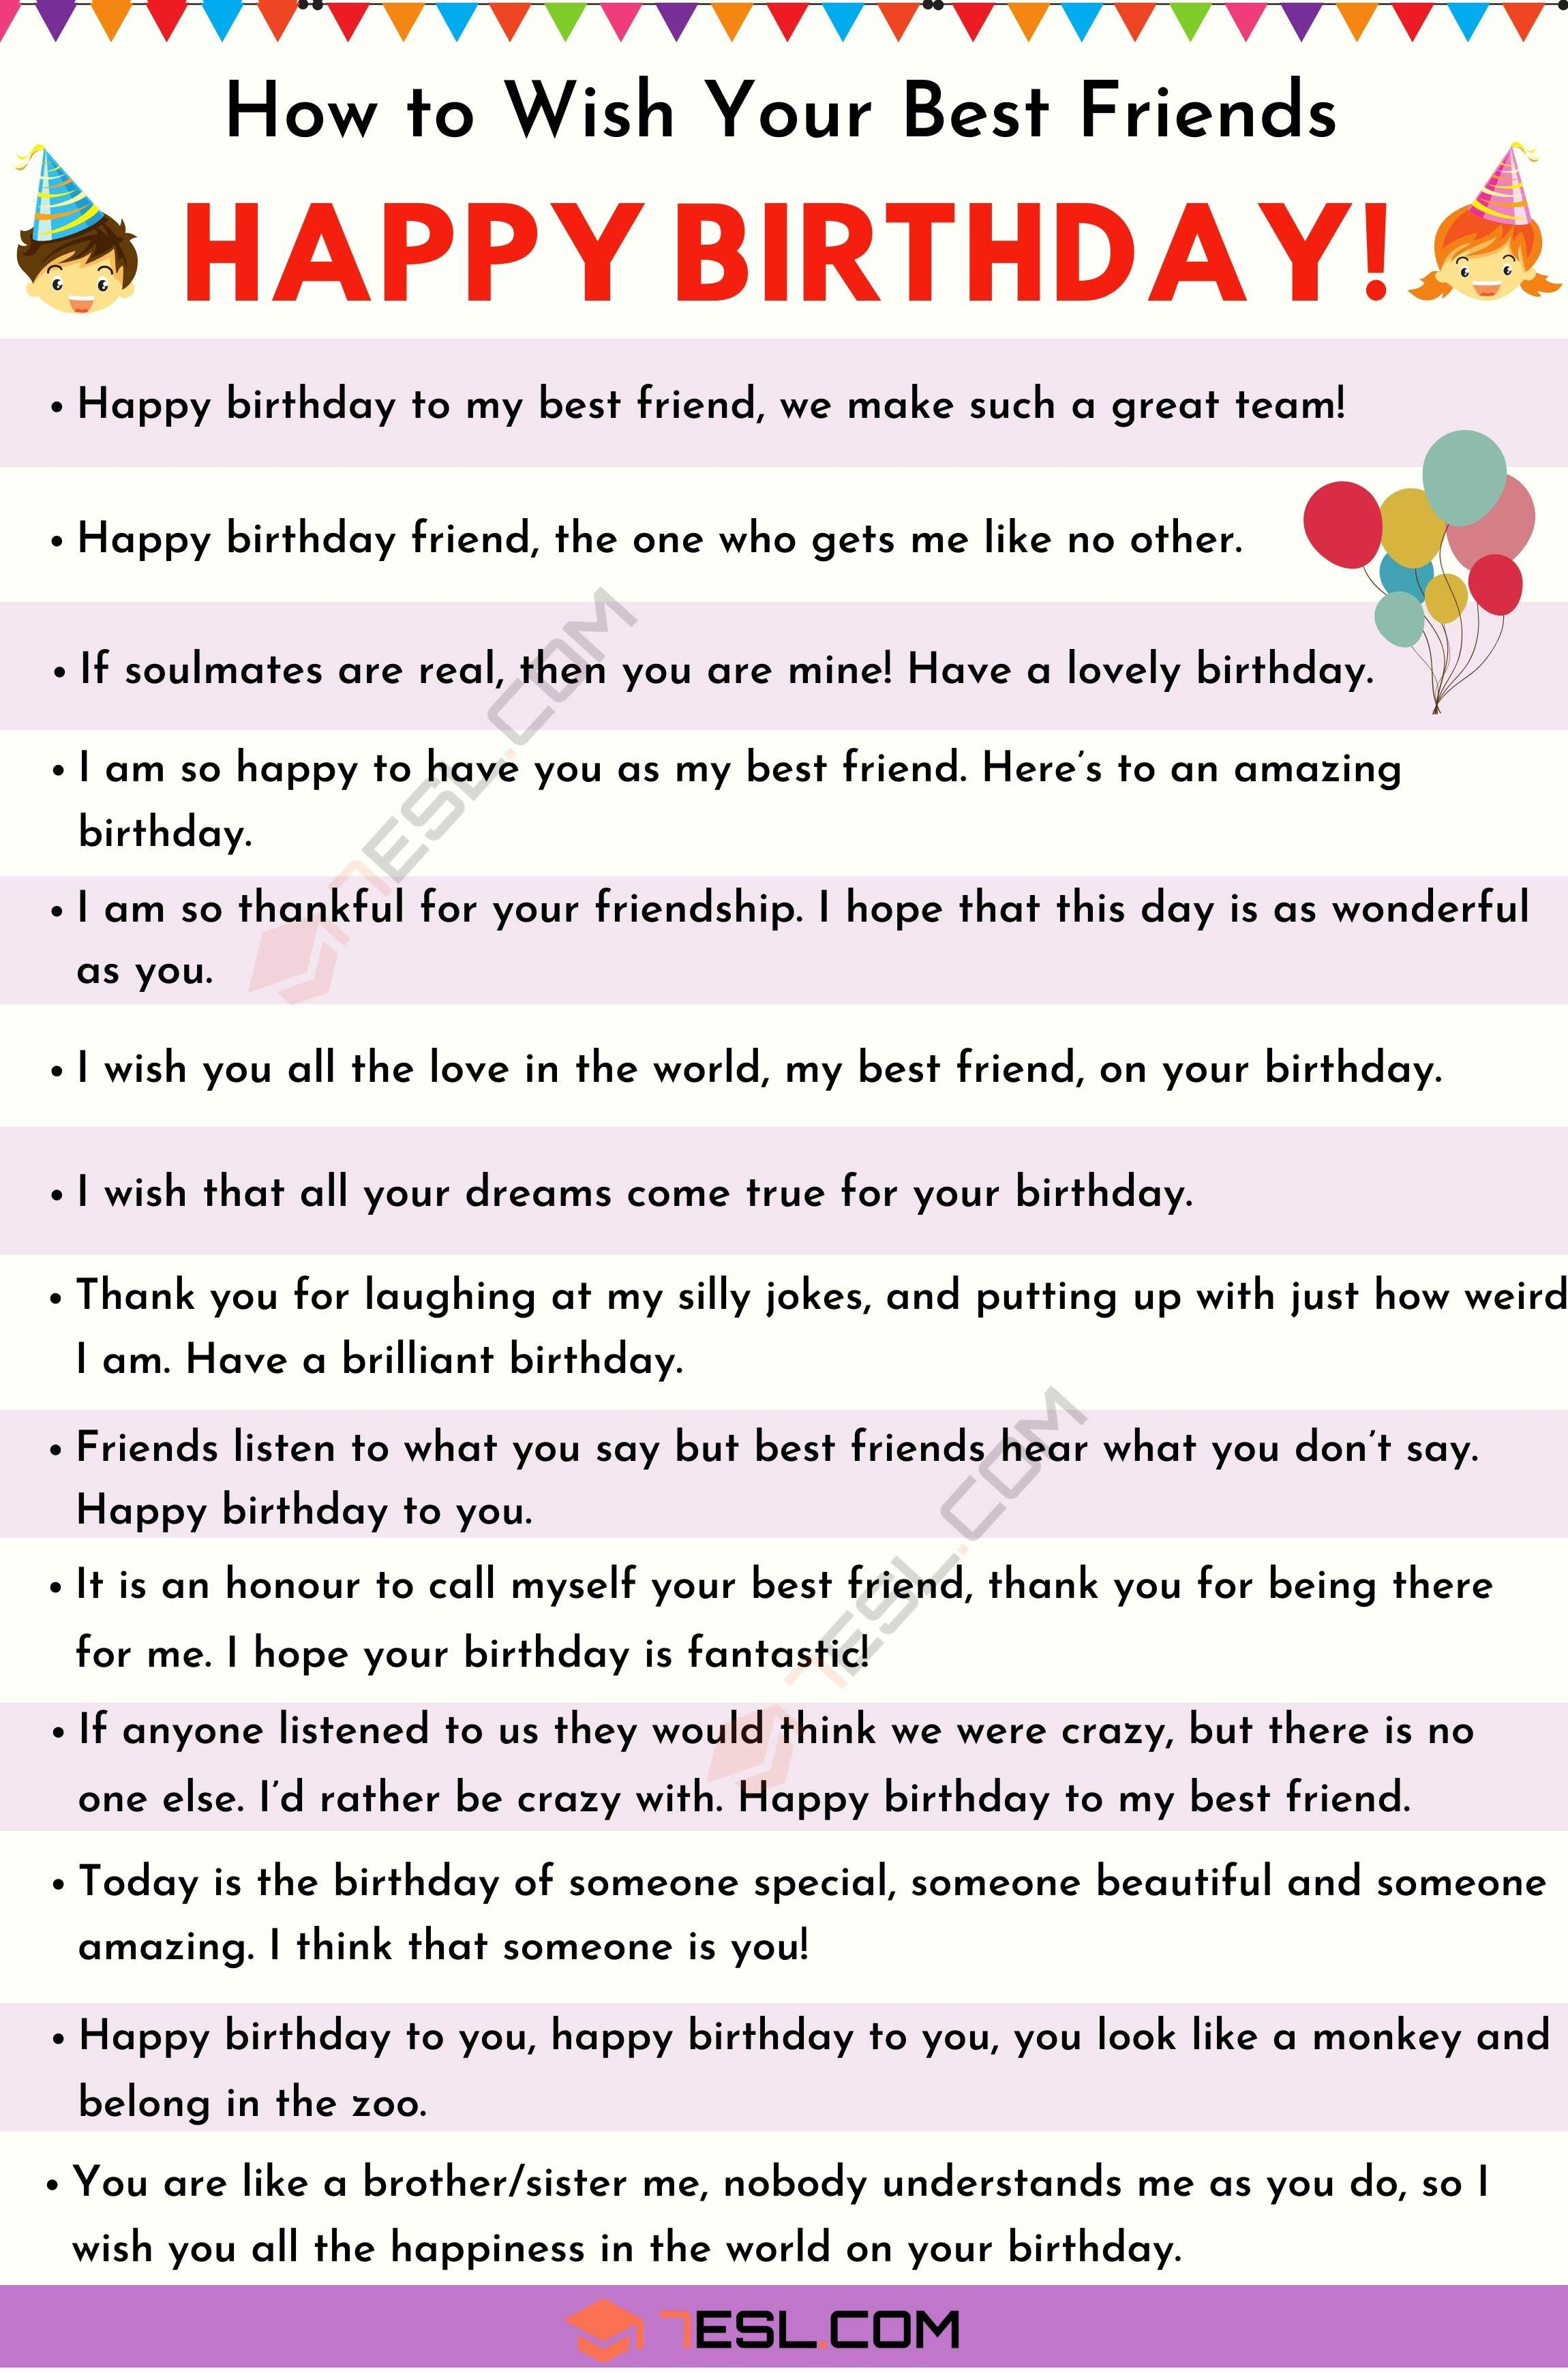 Happy Birthday Friend 35 Heartfelt And Funny Birthday Wishes For Friends 7esl Birthday Wishes For Friend Happy Birthday Best Friend Quotes Friend Birthday Quotes